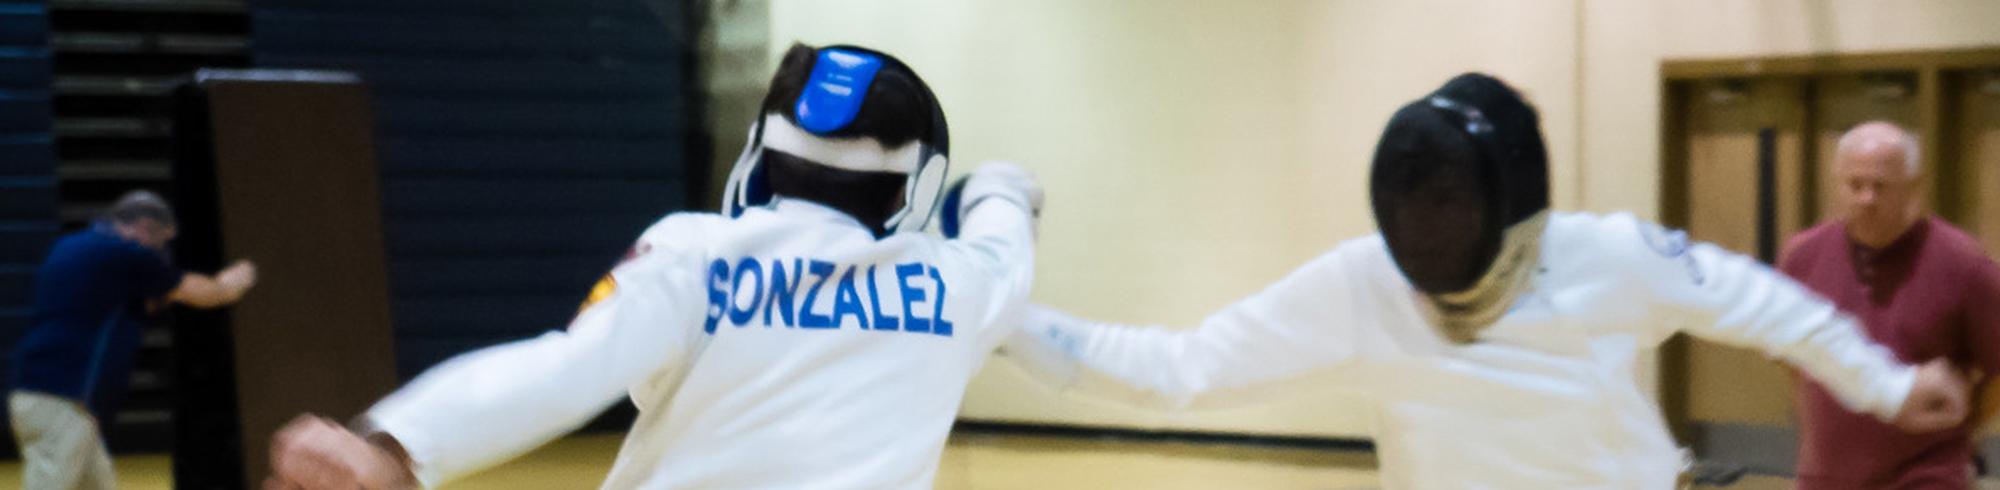 fencing action shot